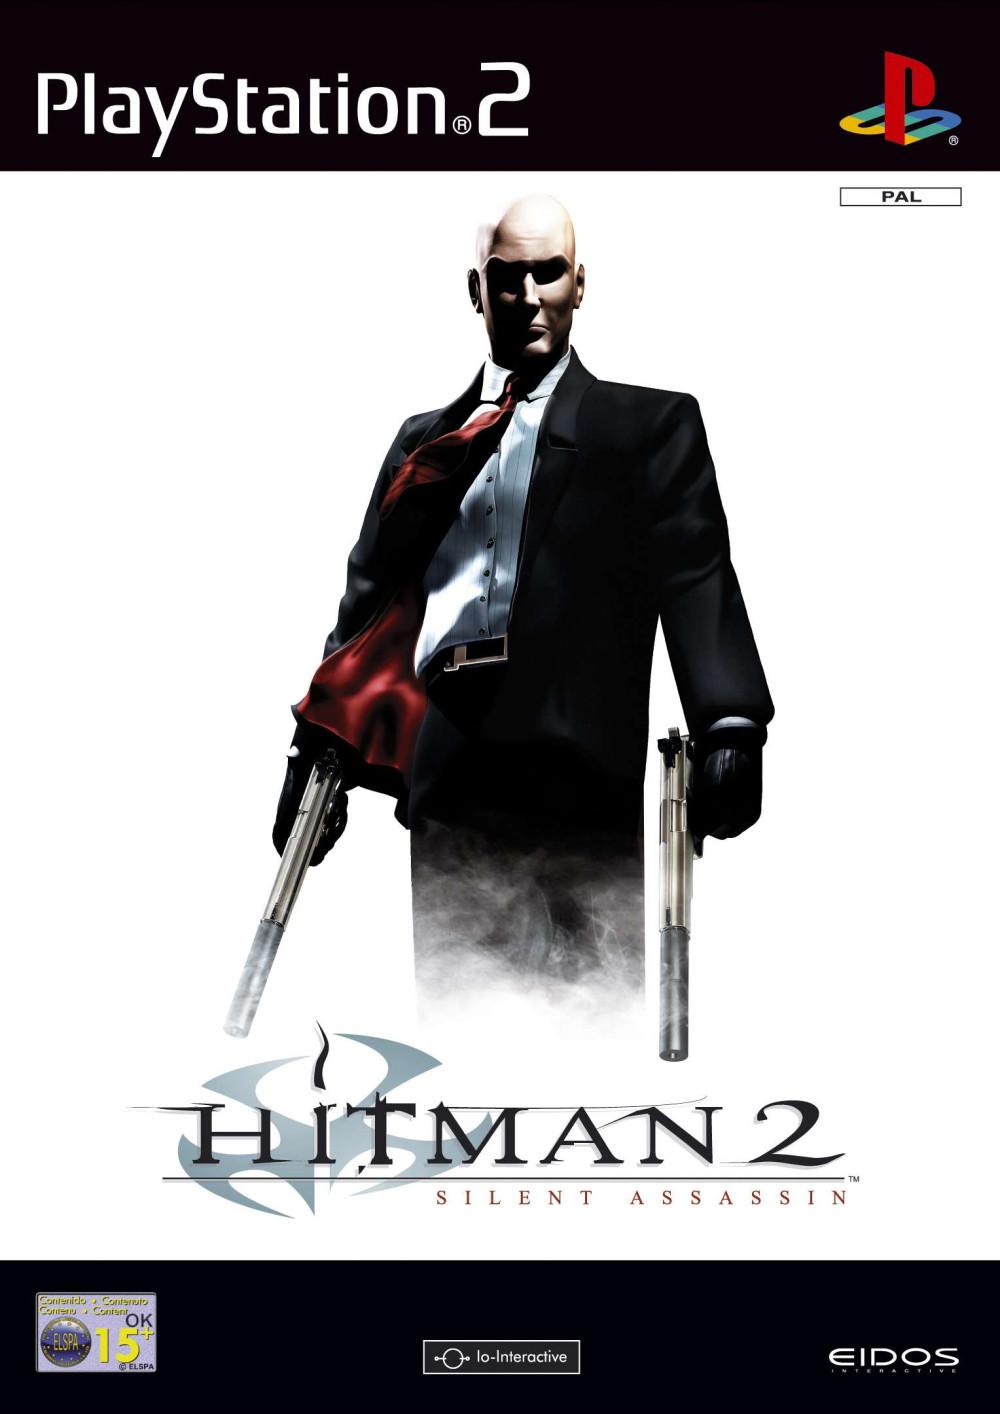 Hitman 2 Silent Assassin PS2